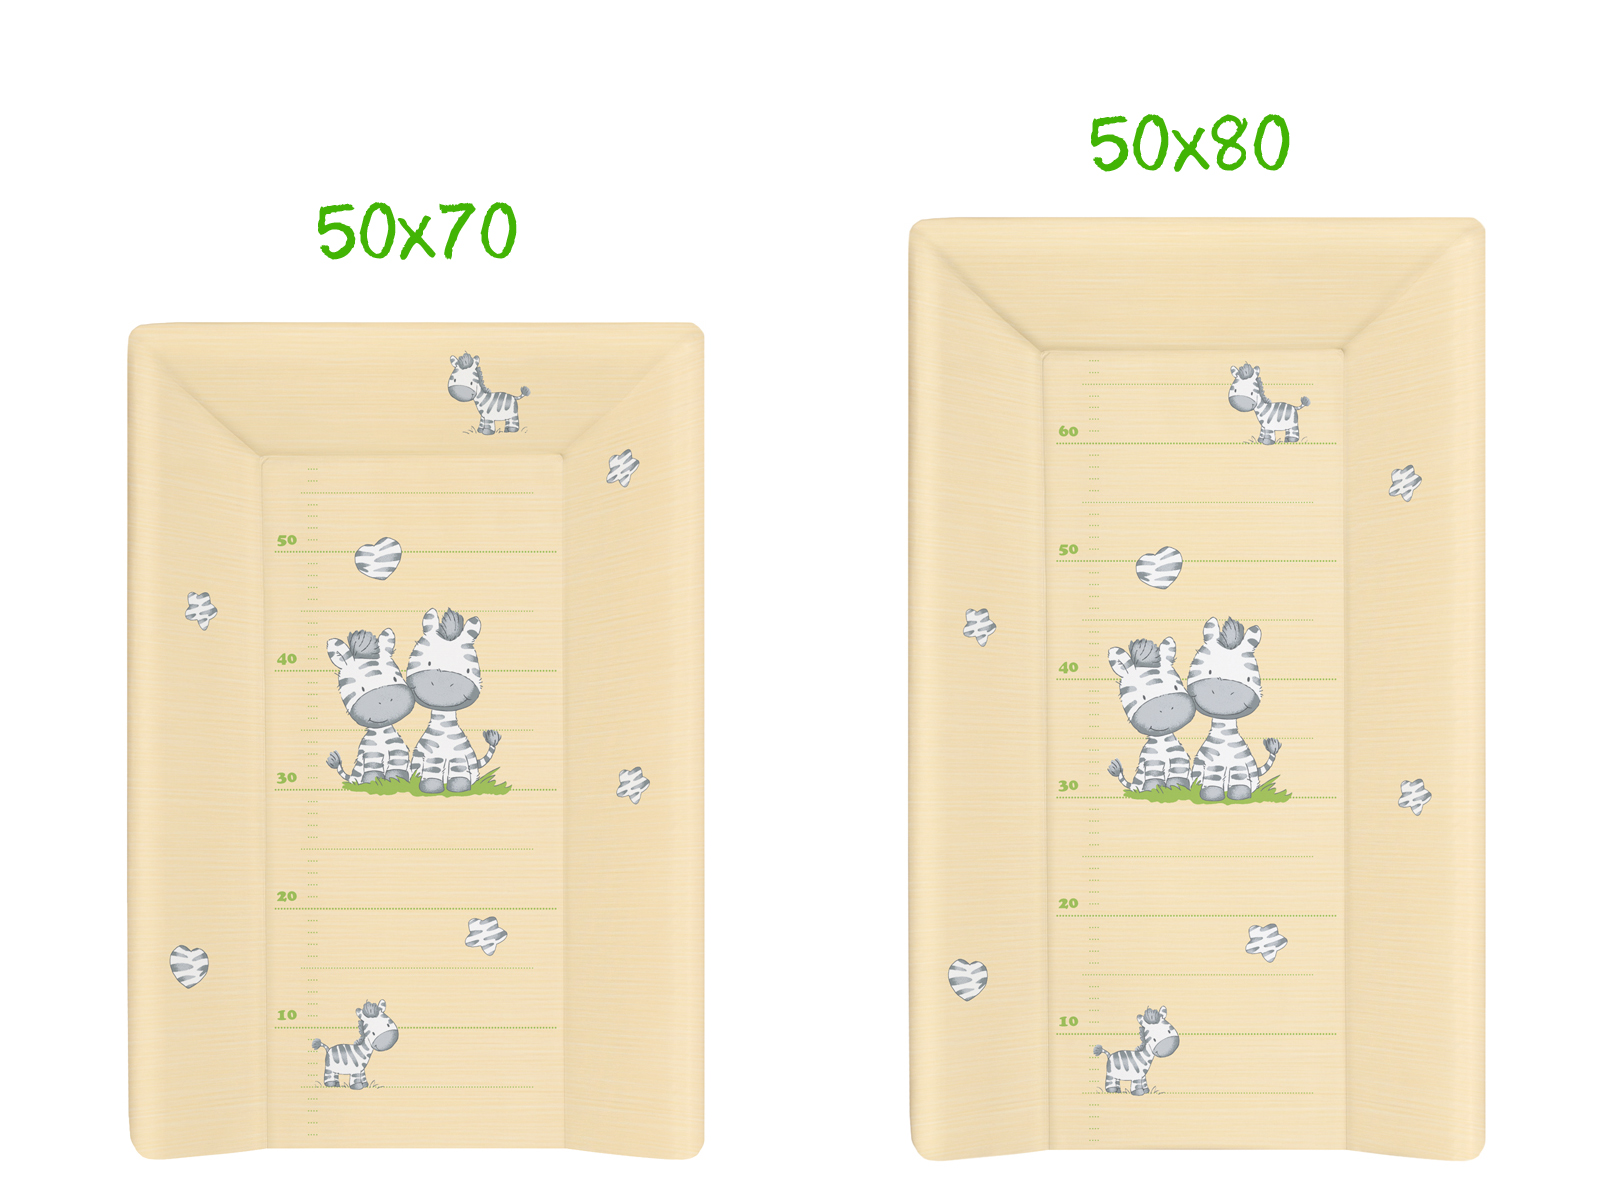 Wickelauflage 50x70 50x80 abwaschbar PVC 2 Keil feste Wickelunterlage Farbig